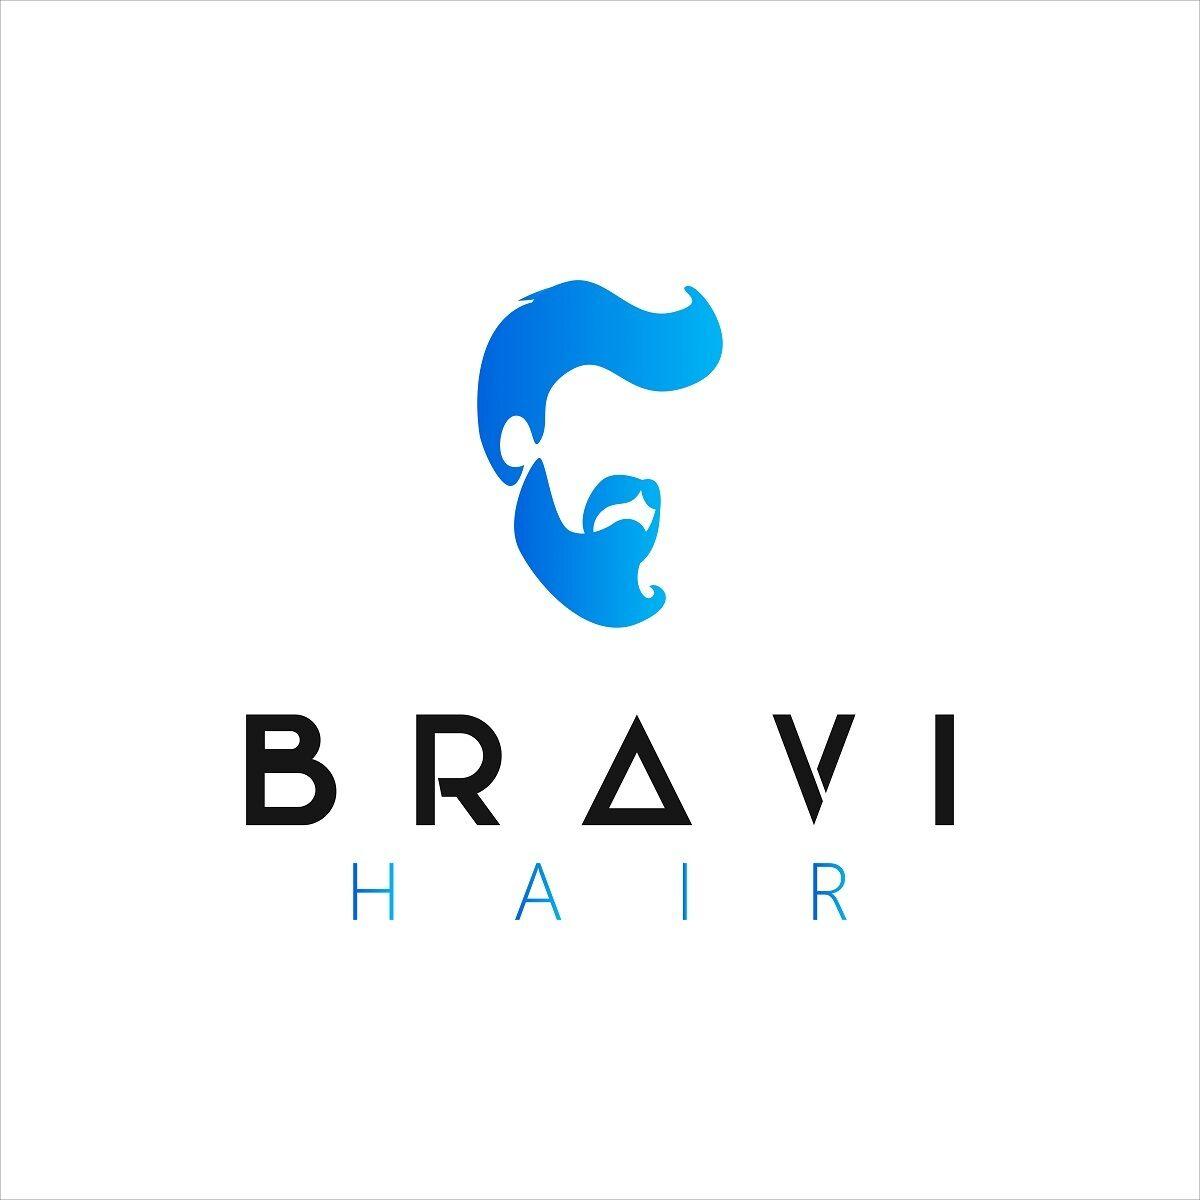 Bravihair